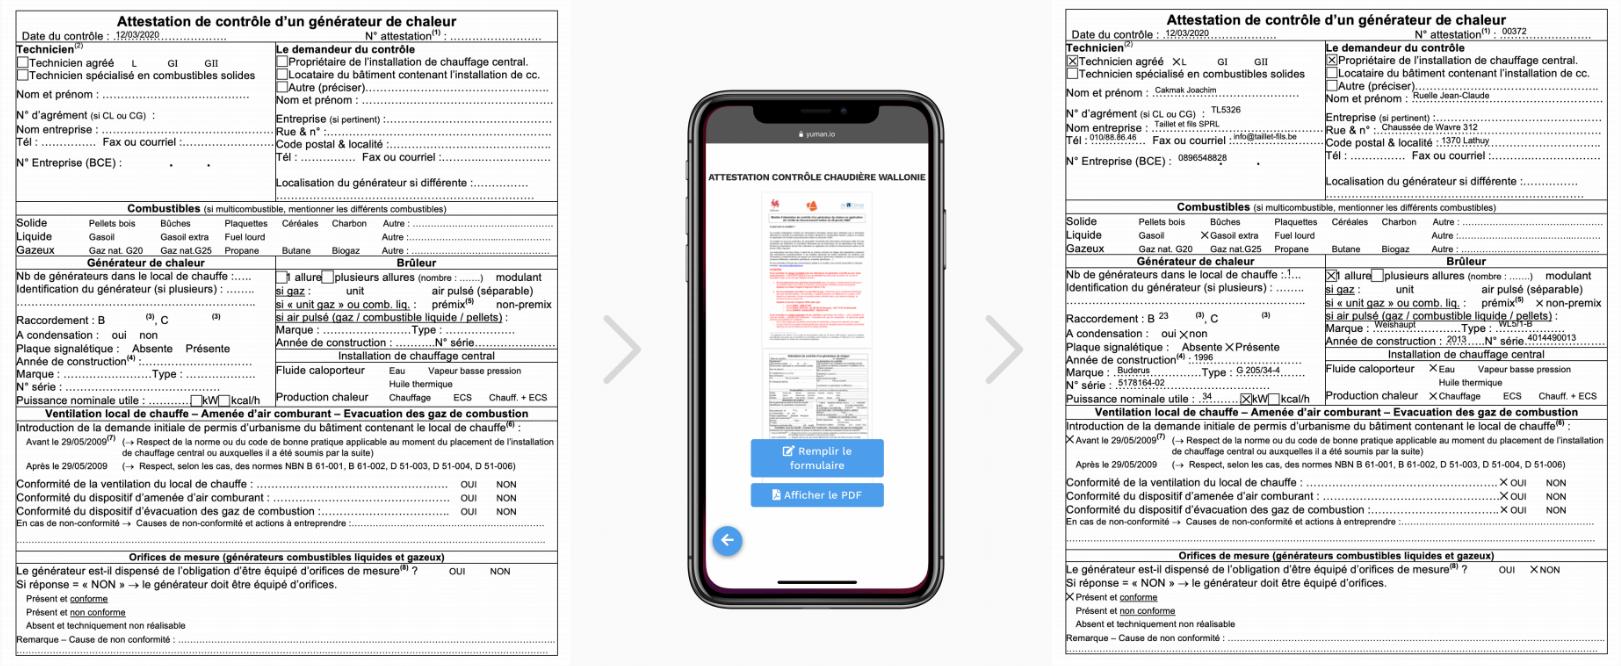 Business form management software - Yuman CMMS - Forms data - sending clients pdf documents